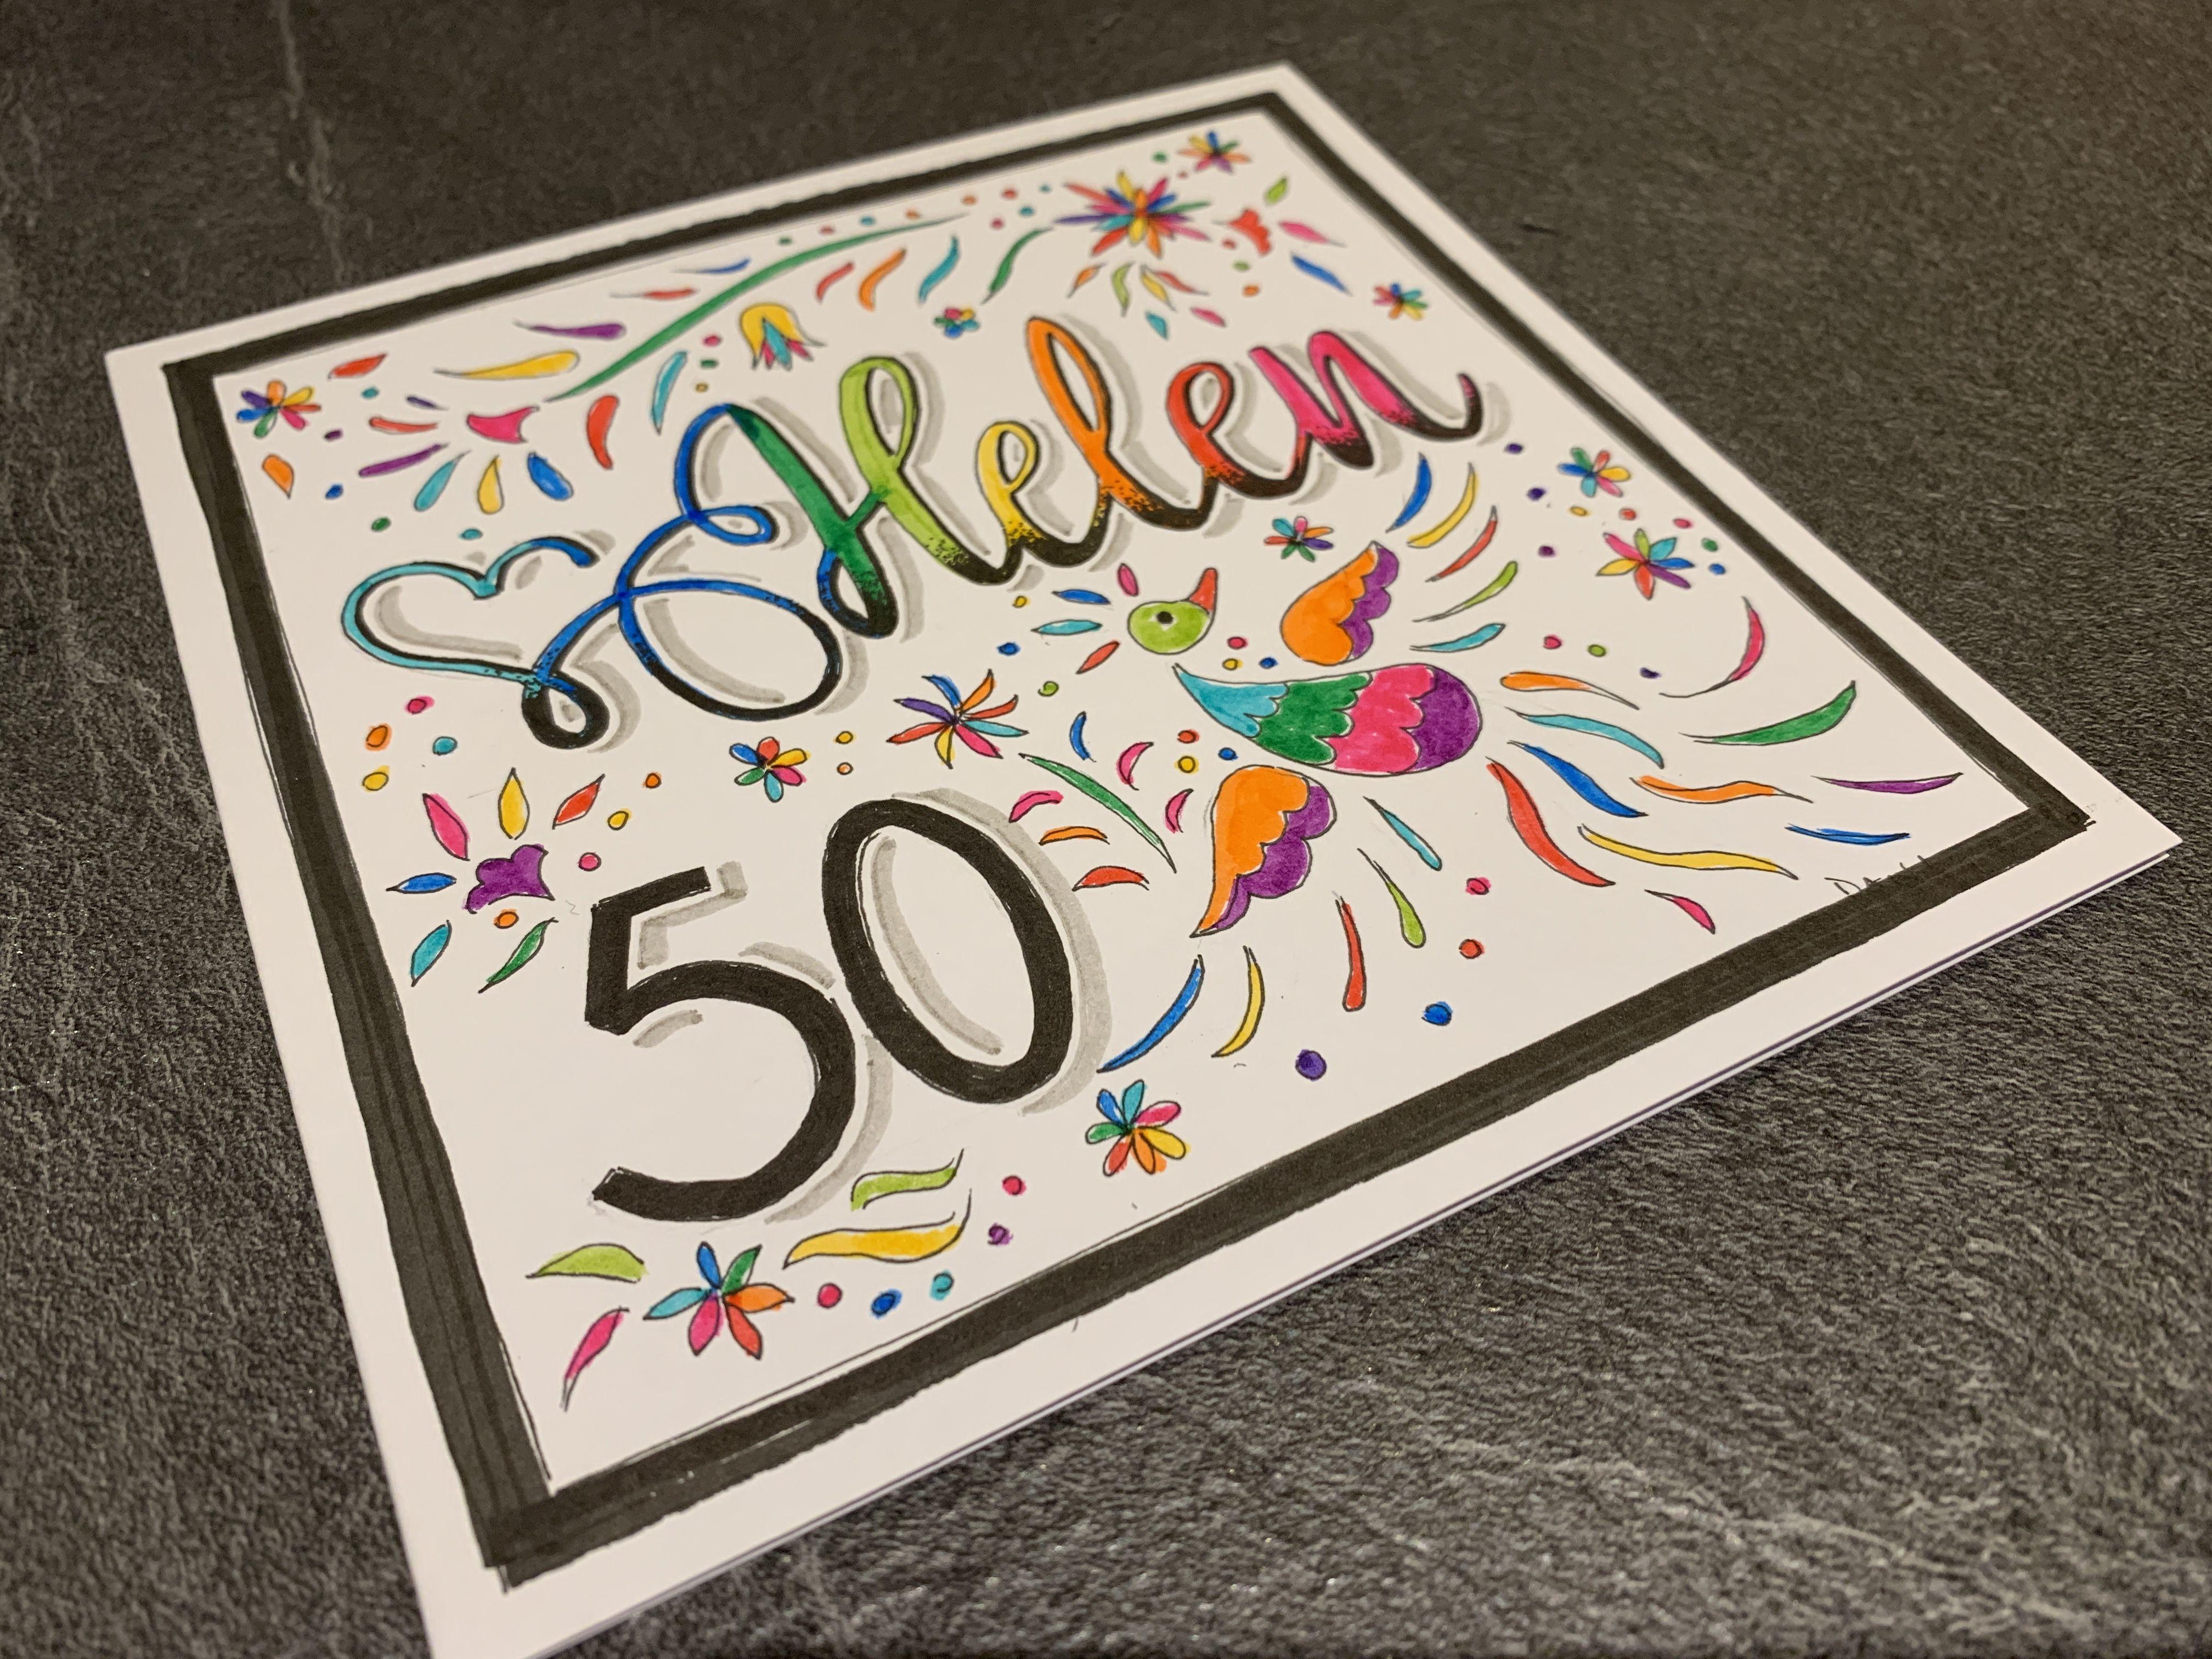 50th Birthday Card Personalised 50th Birthday Cards Birthday Cards Personal Cards